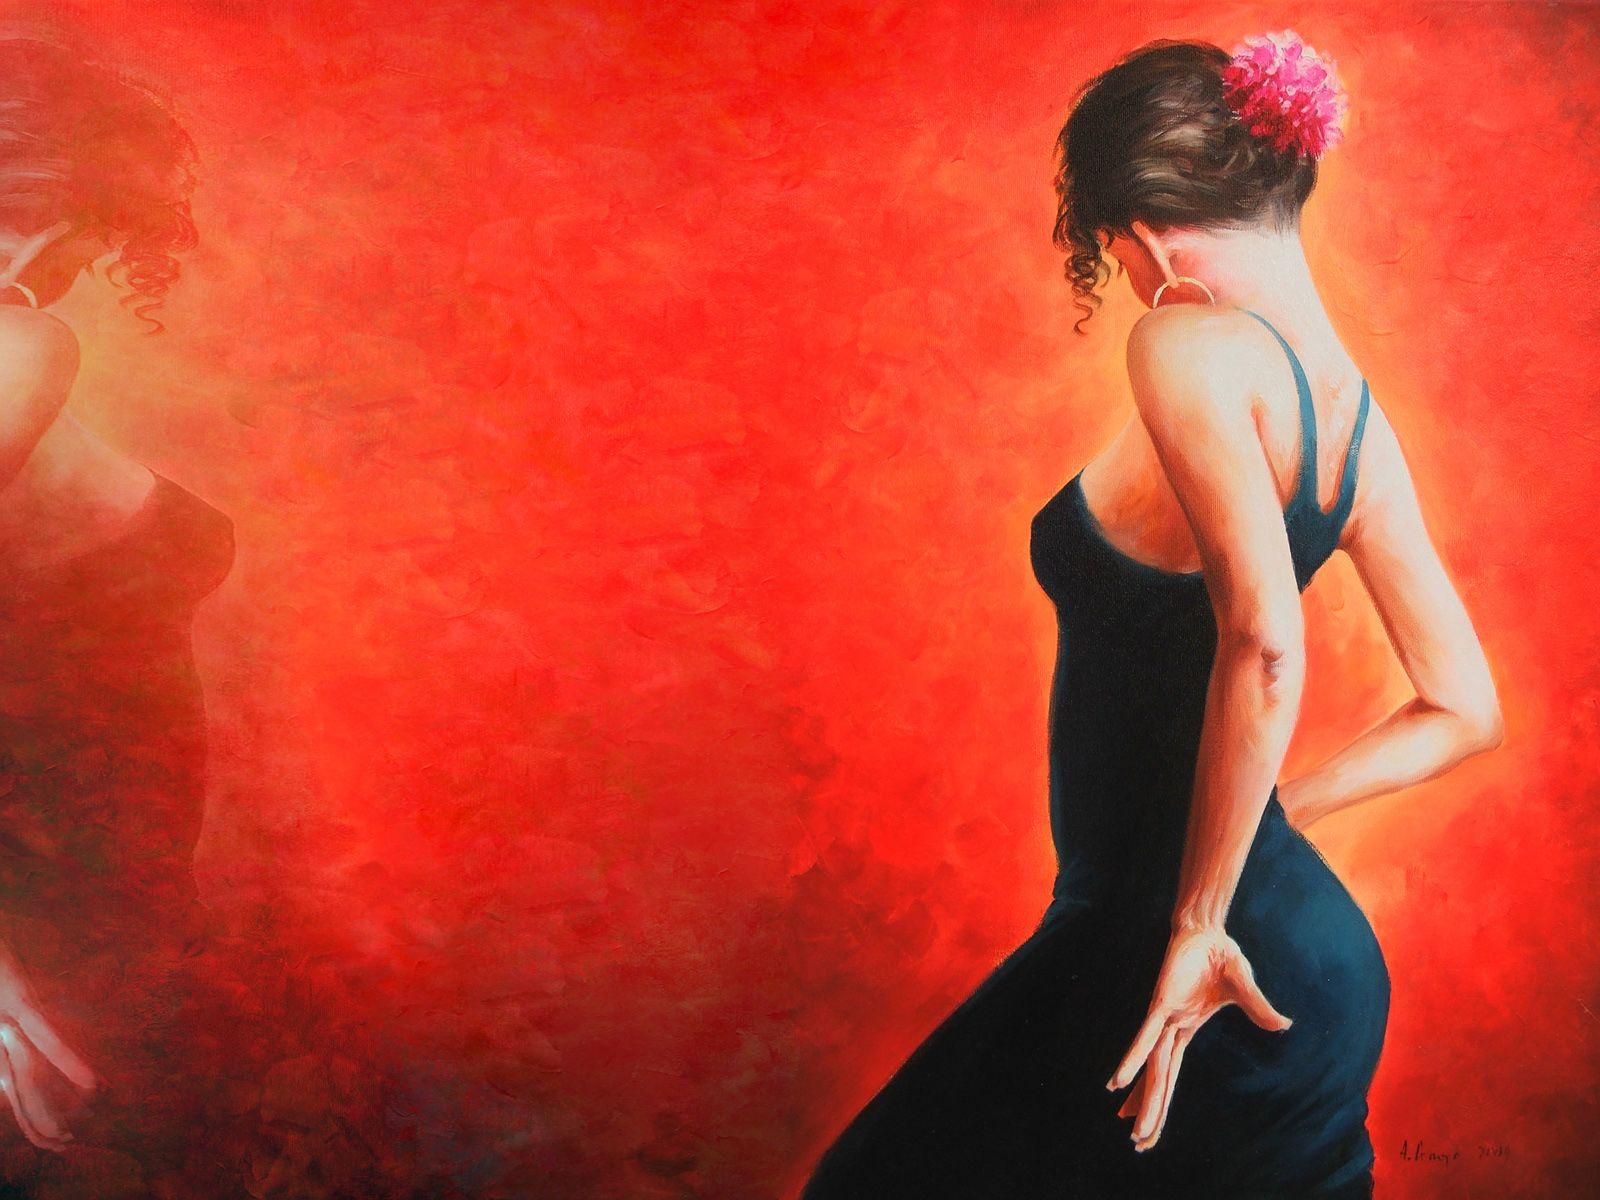 flamenco spain dancer woman by lord iluvatar women